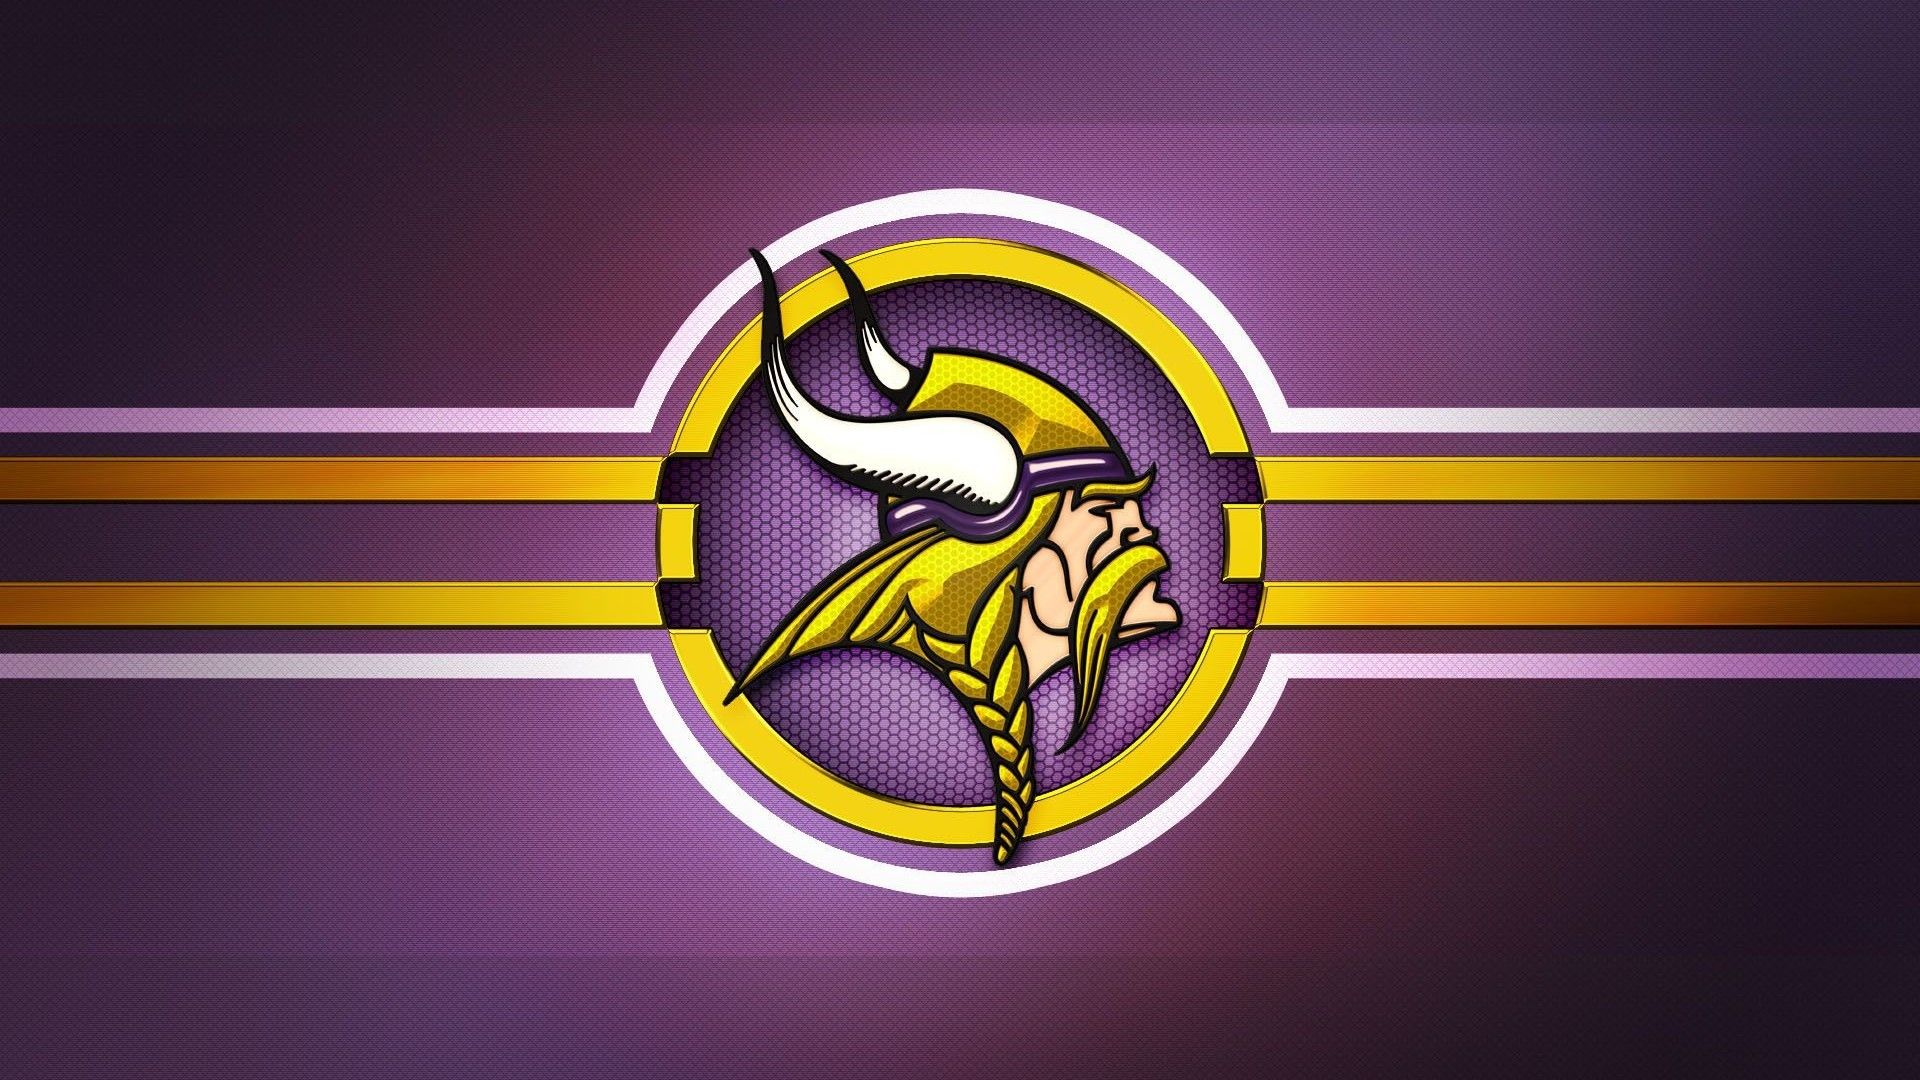 Minnesota Vikings picture